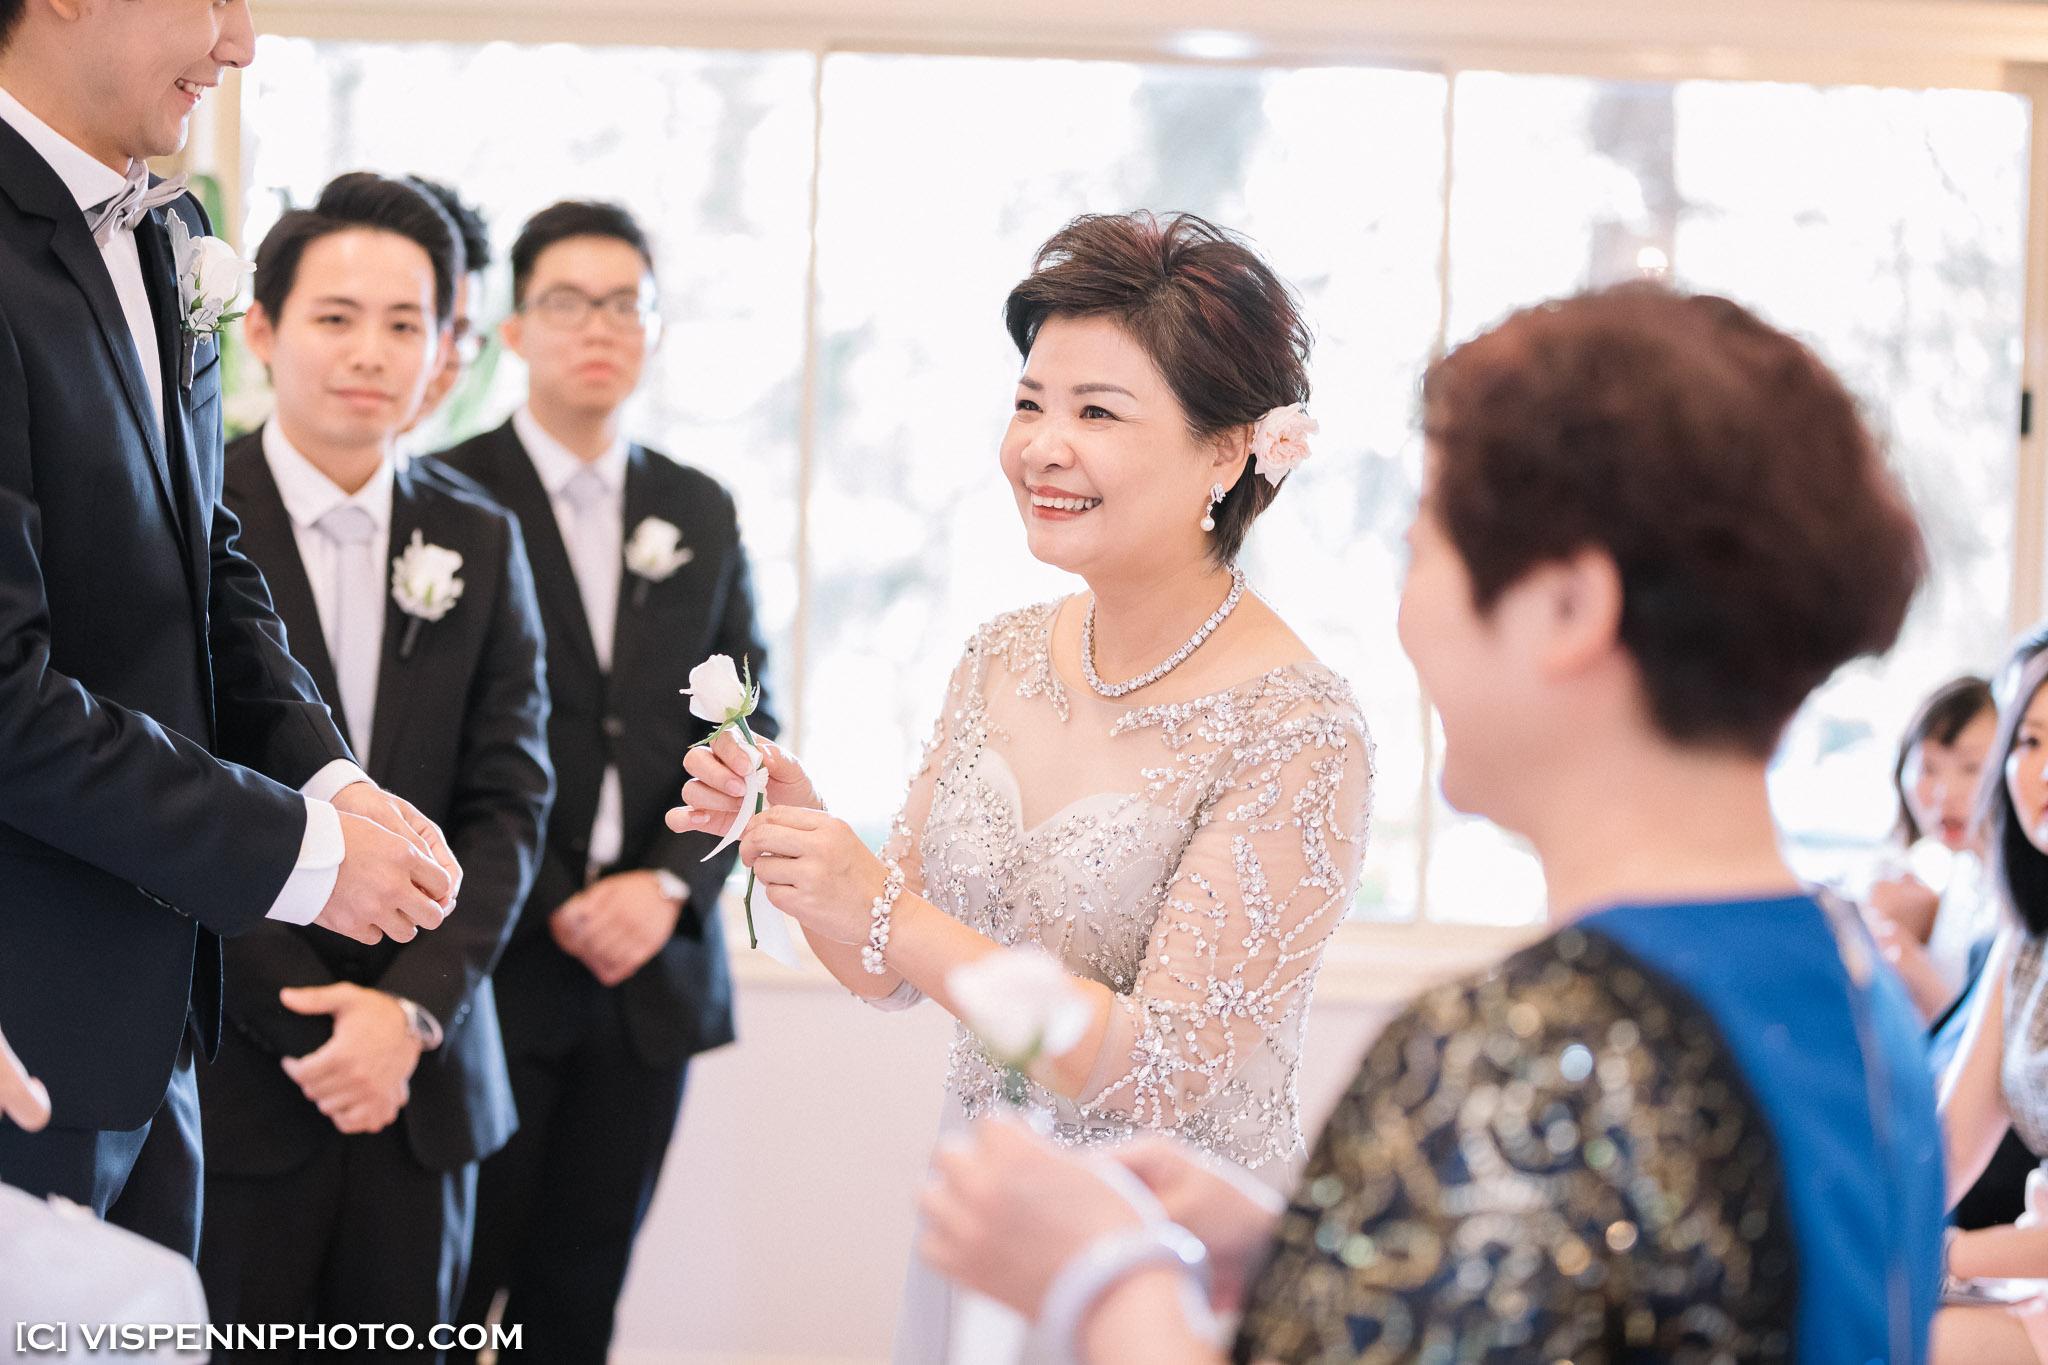 WEDDING DAY Photography Melbourne VISPENN 墨尔本 婚礼跟拍 婚礼摄像 婚礼摄影 结婚照 登记照 VISPENN H4 0282